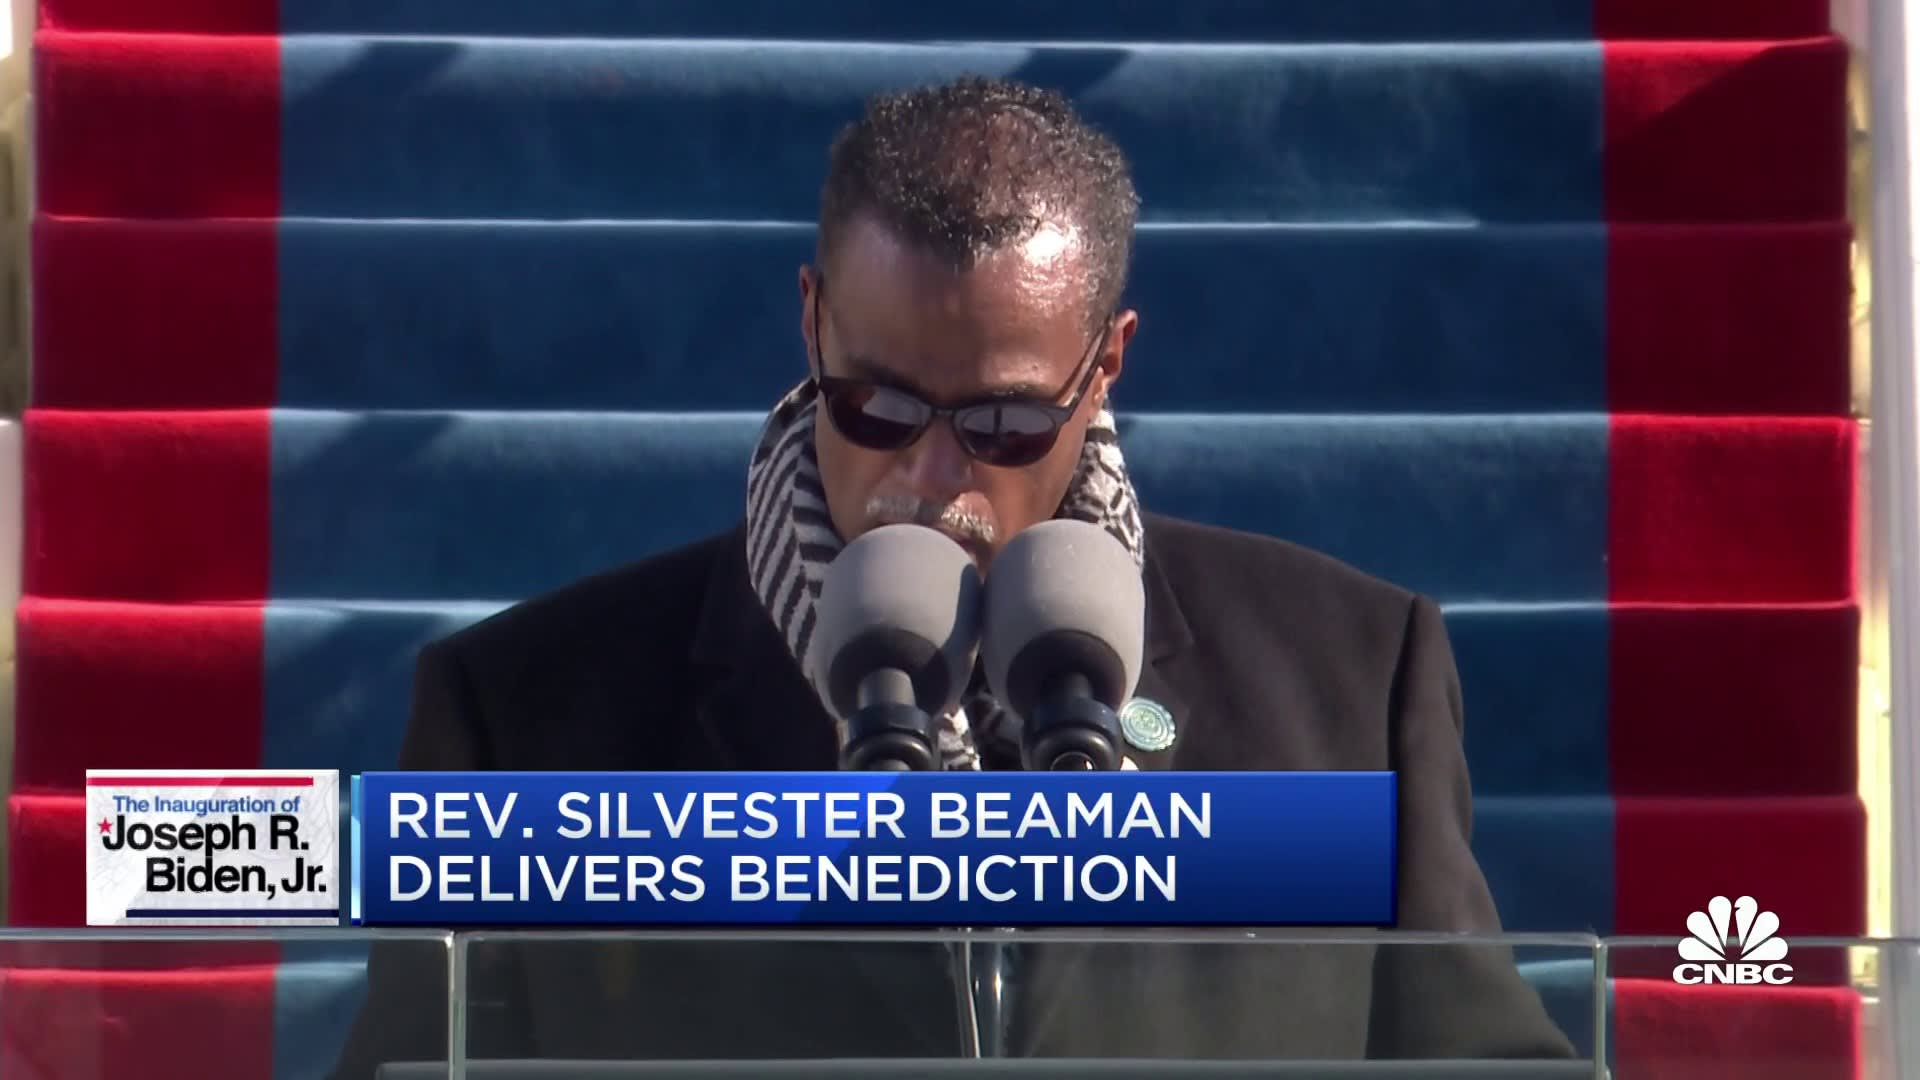 Rev. Silvester Beaman delivers benediction